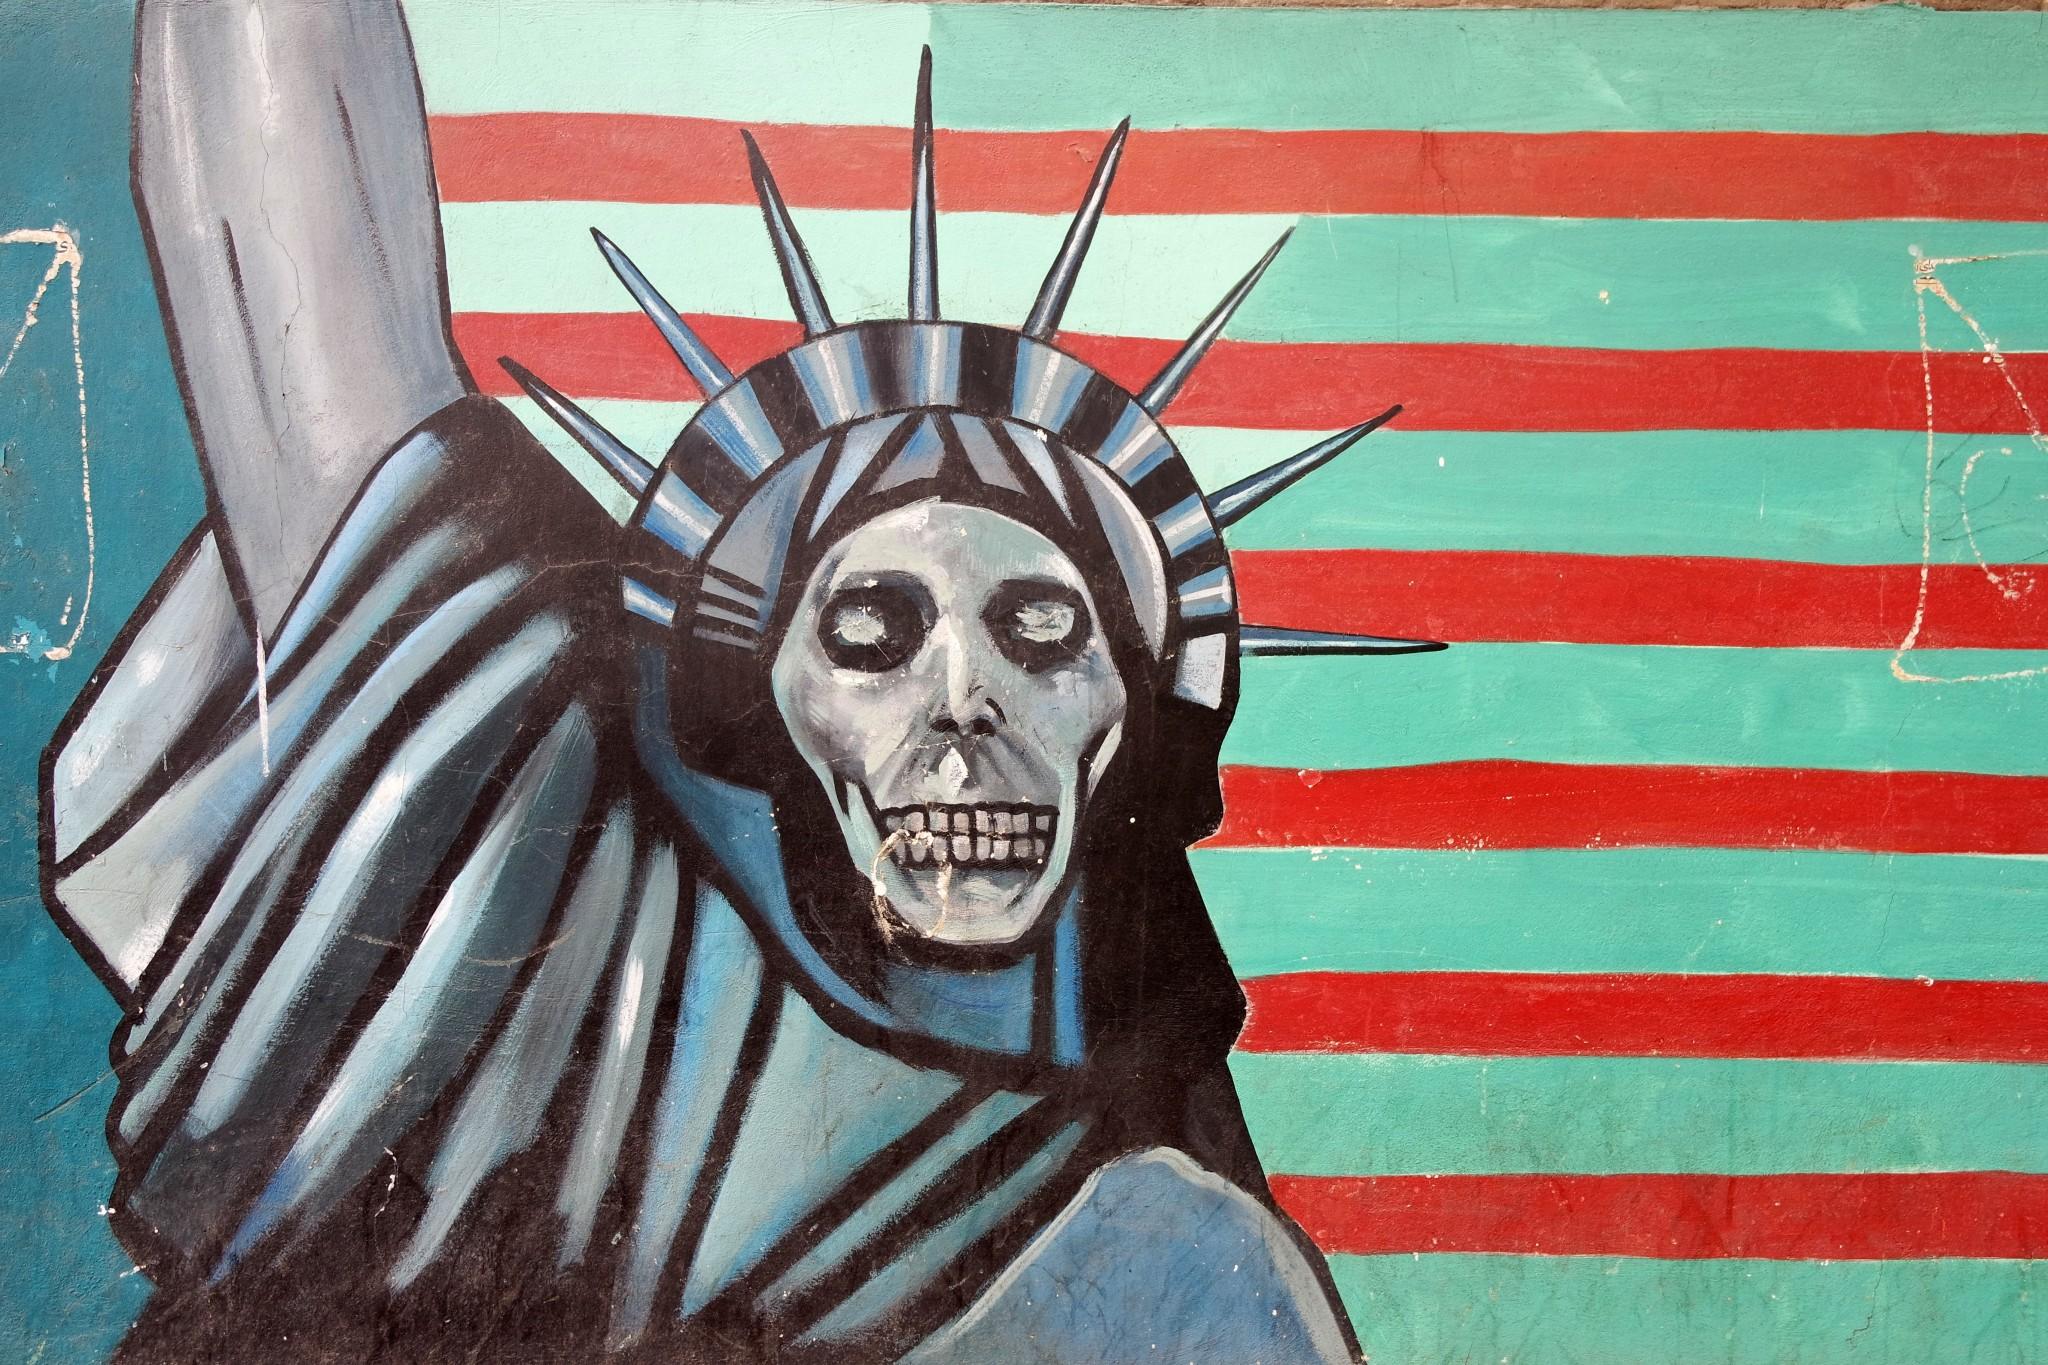 tehran-amerikanskoe-posolstvo